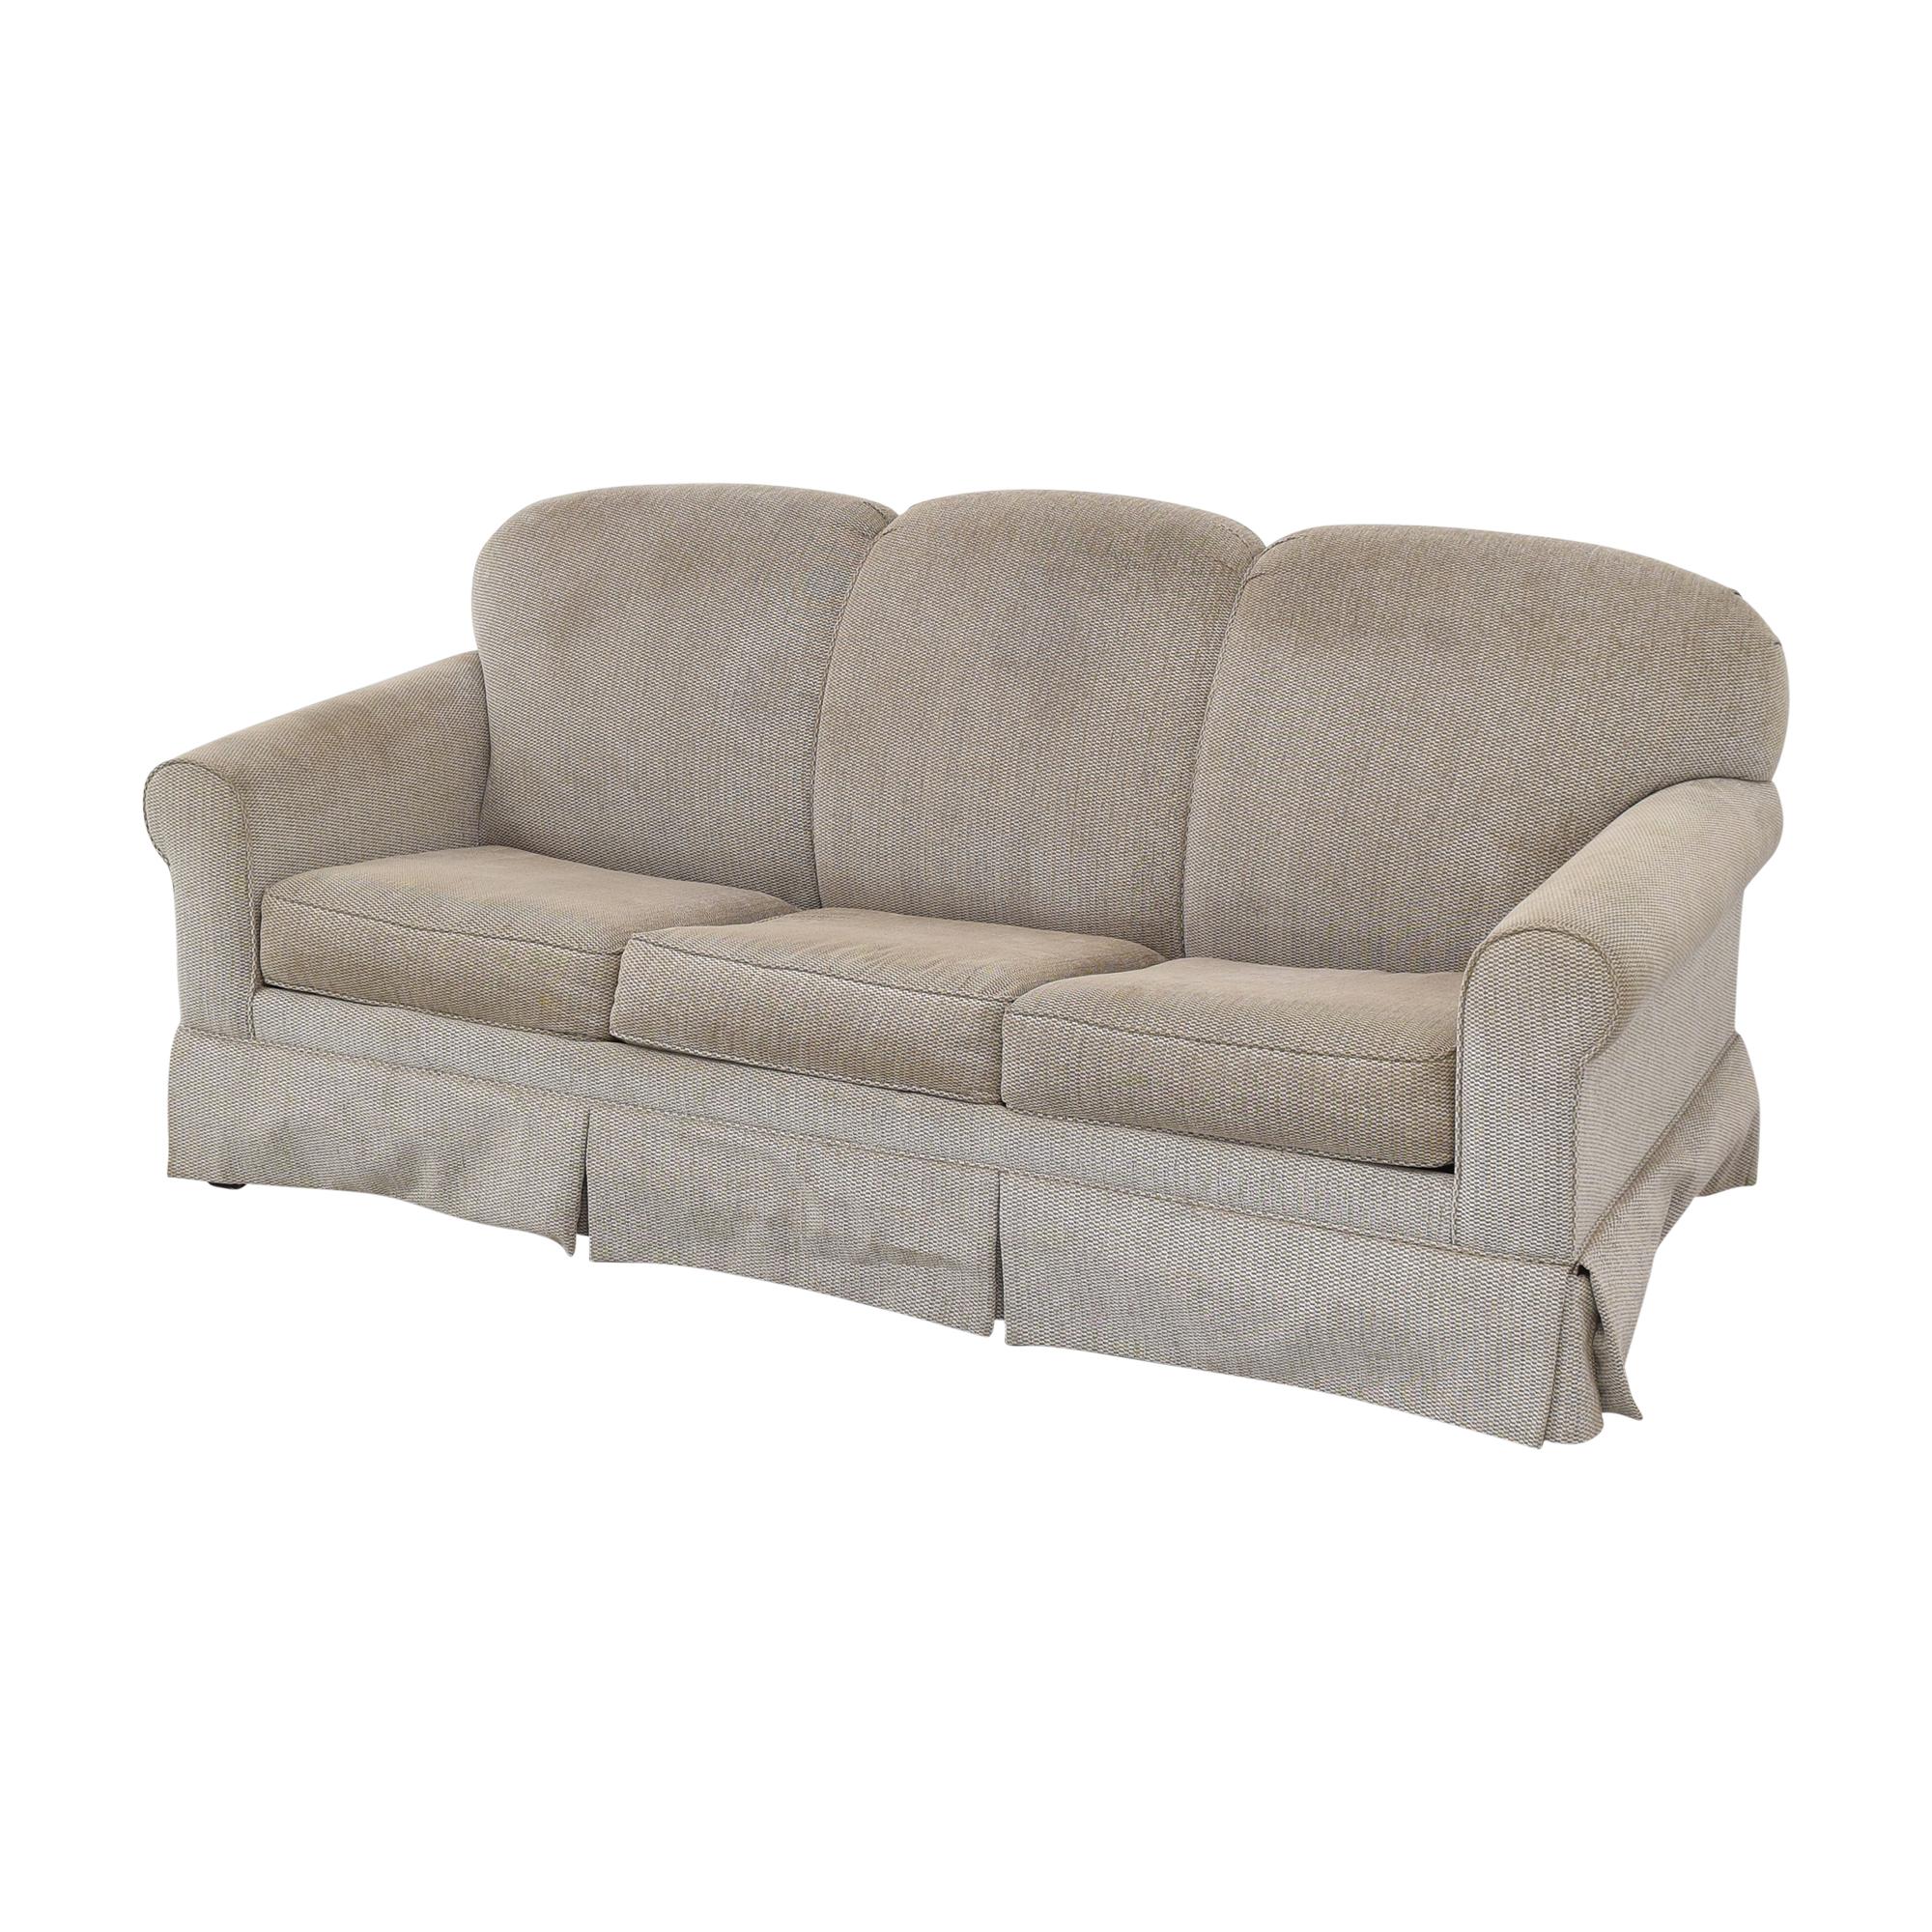 Craftmaster Furniture Craftmaster Full Size Sleeper Sofa used